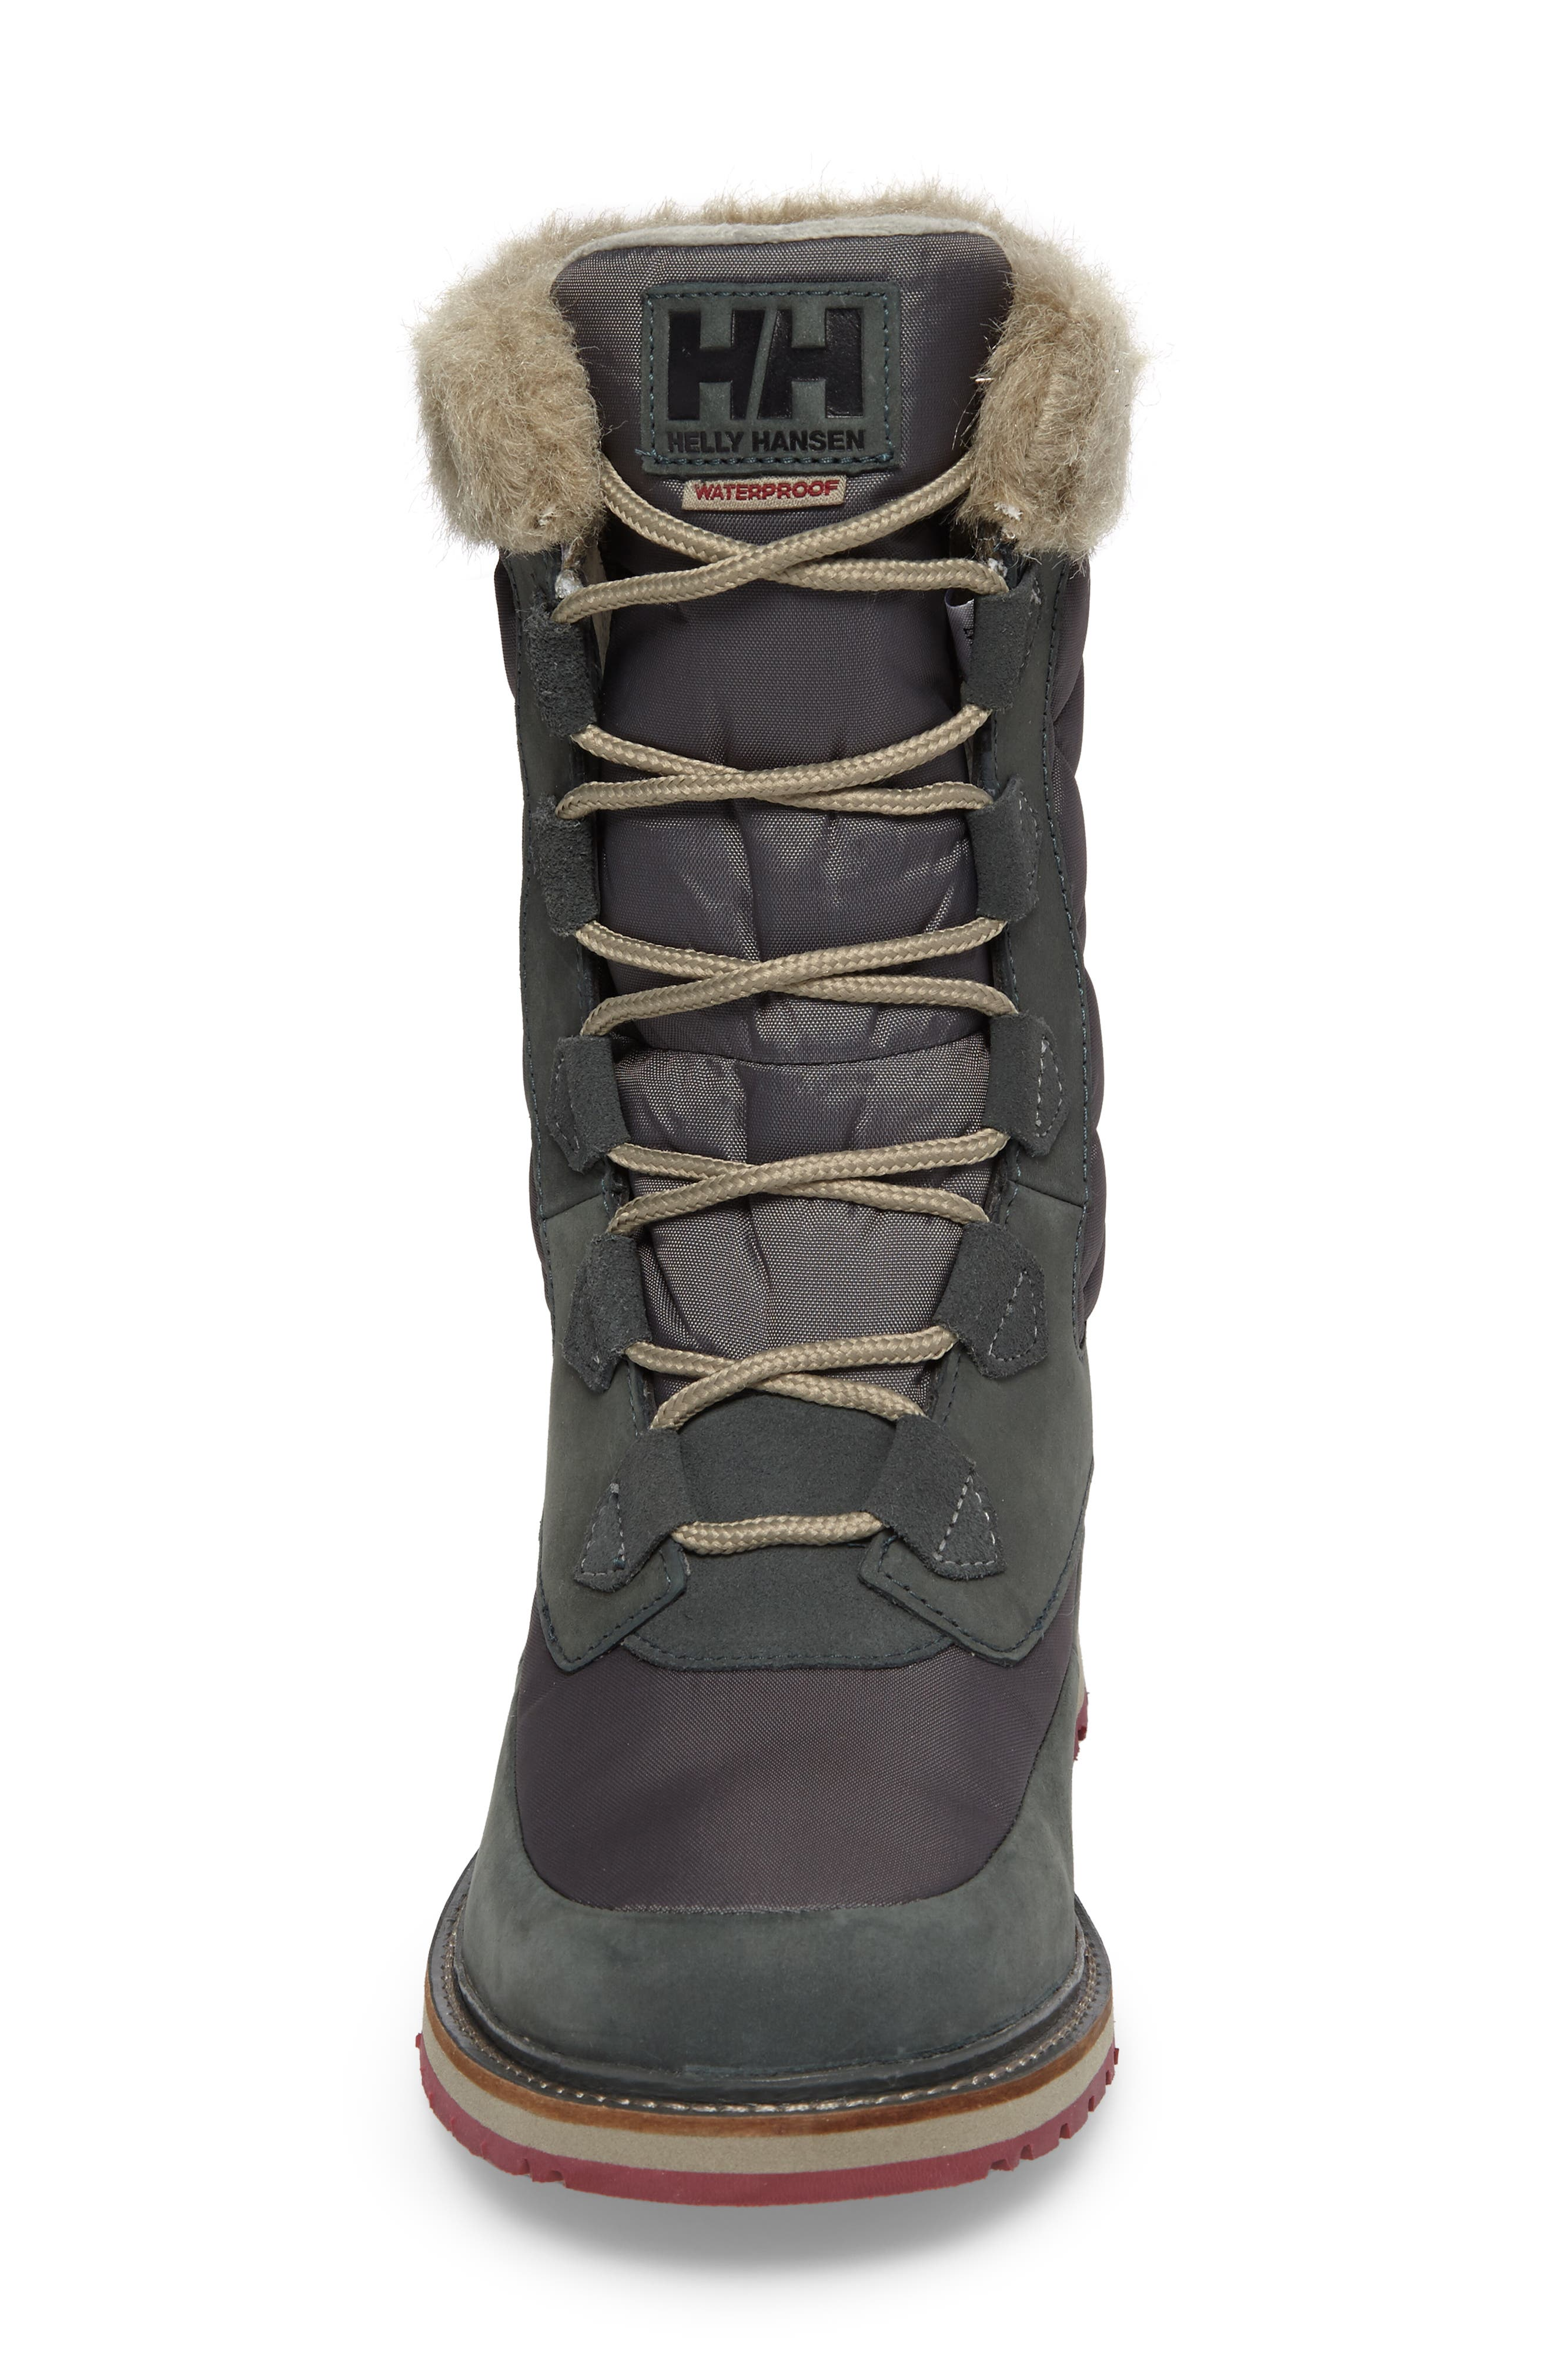 Arosa Waterproof Boot with Faux Fur Trim,                             Alternate thumbnail 4, color,                             Darkest Spruce / Rock / La